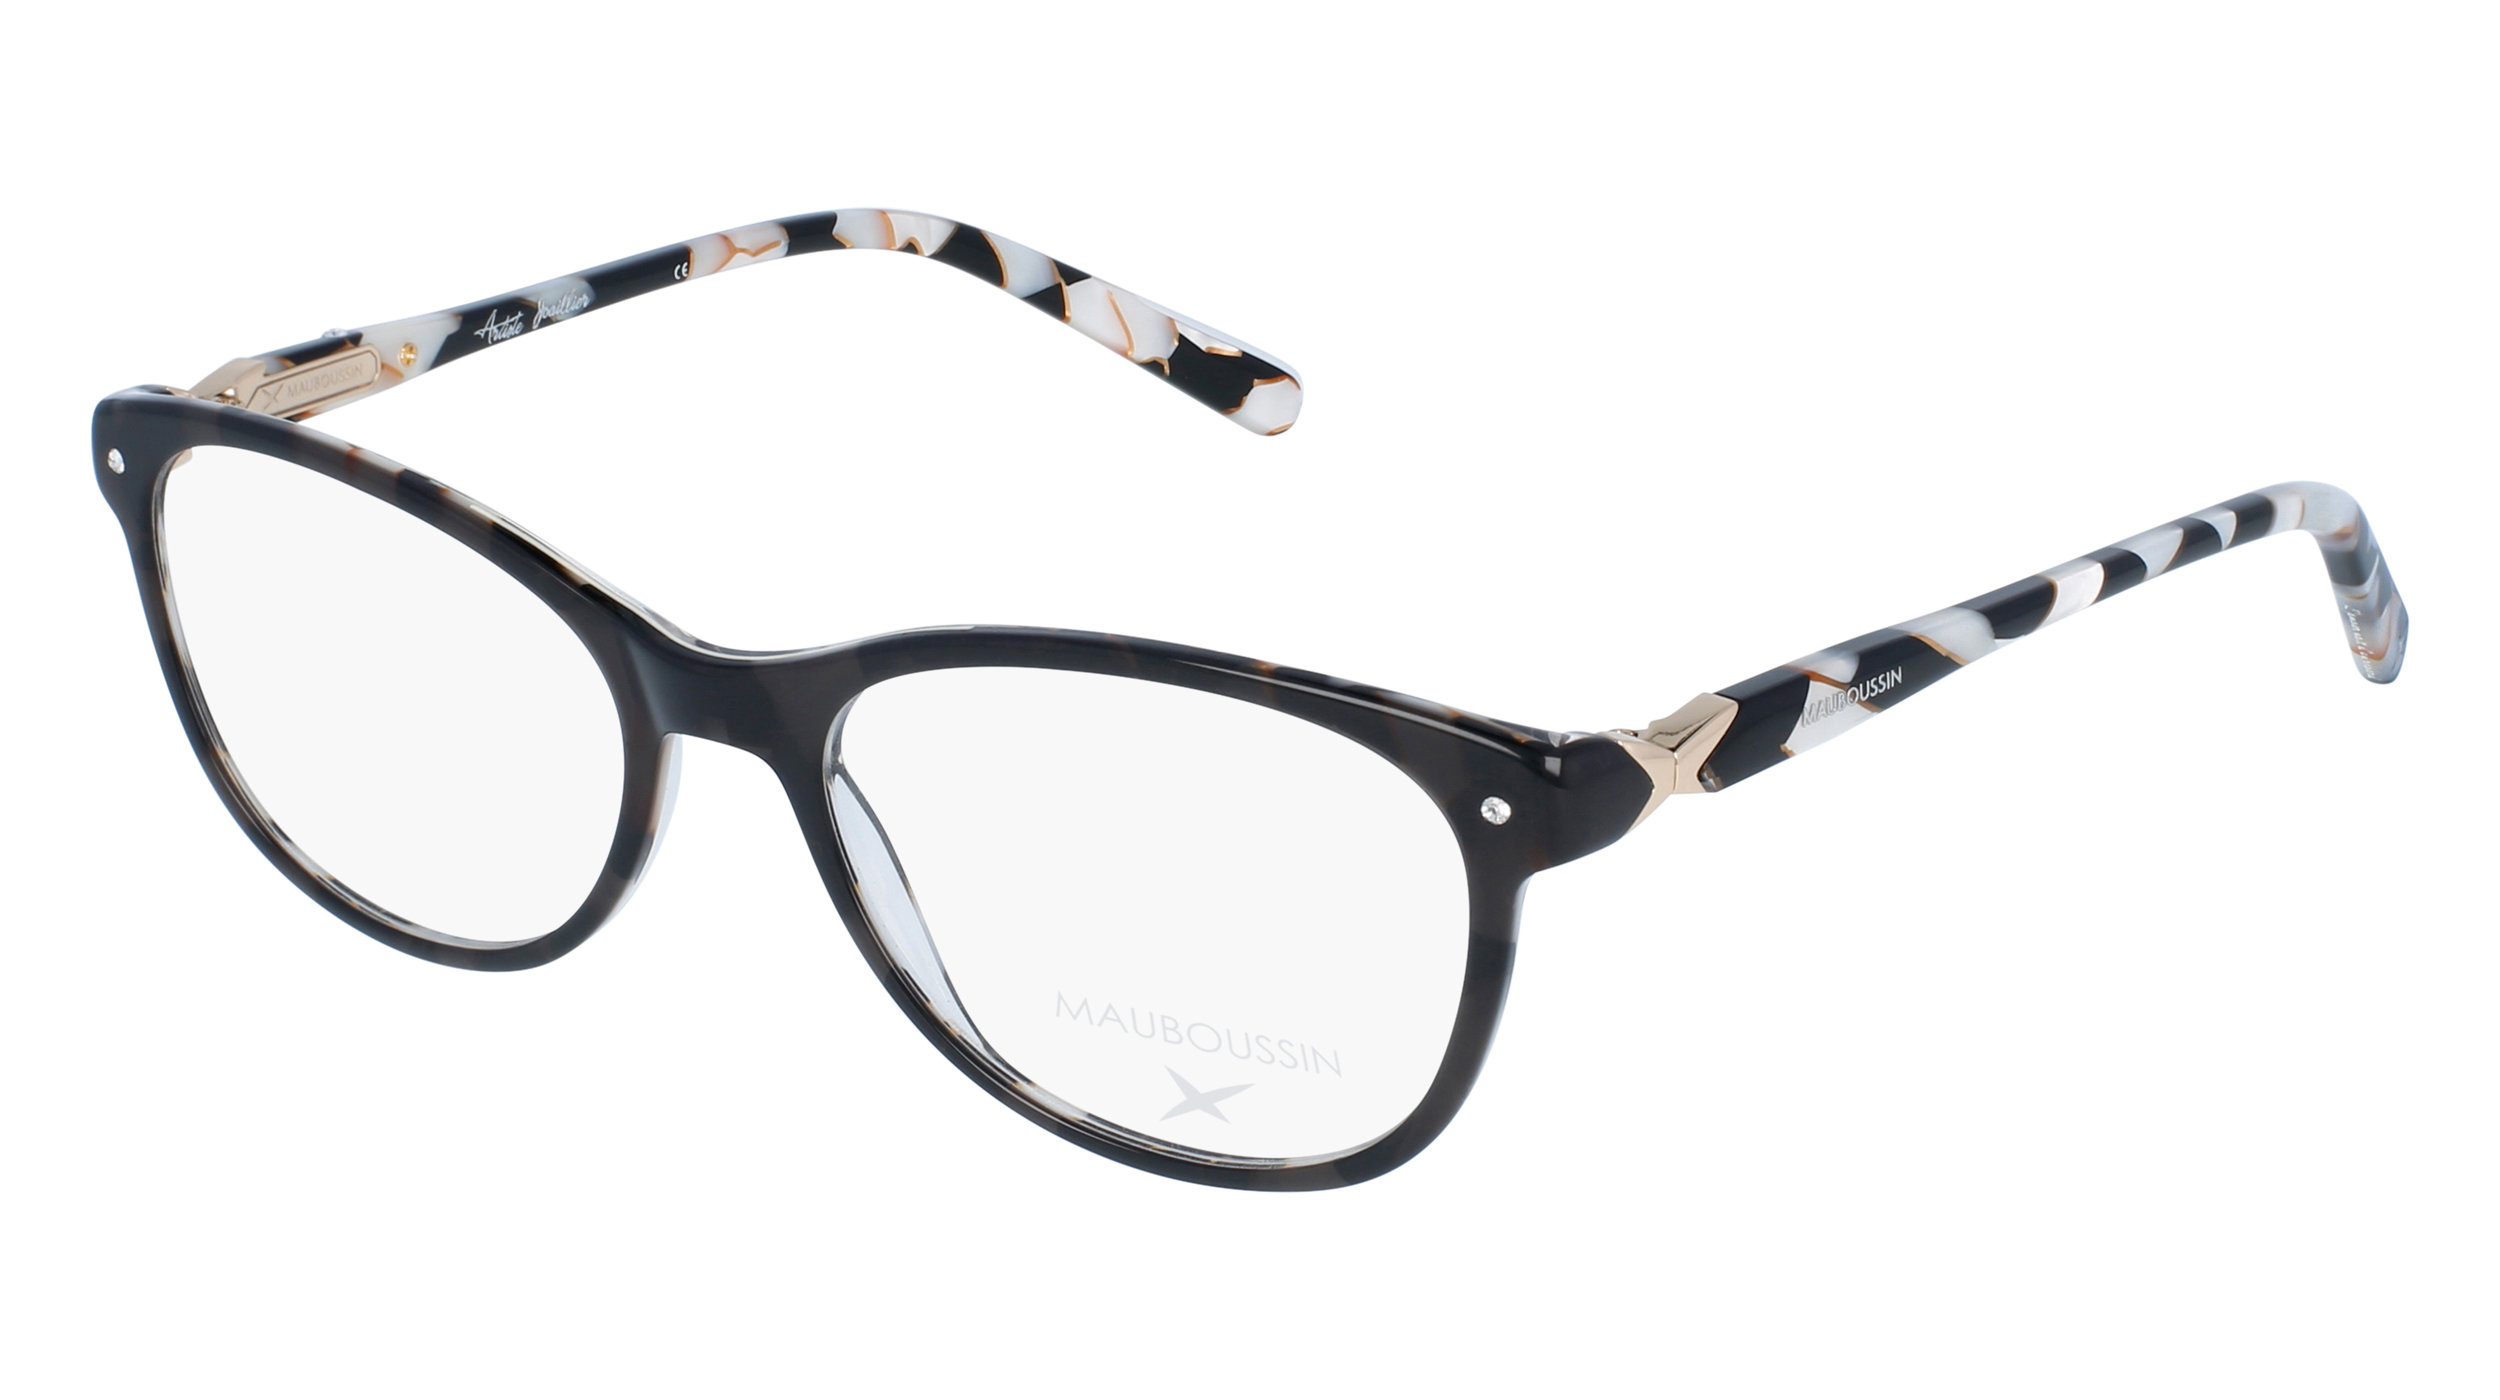 on feet at quality products innovative design MAU 1607 | Mauboussin-eyewear